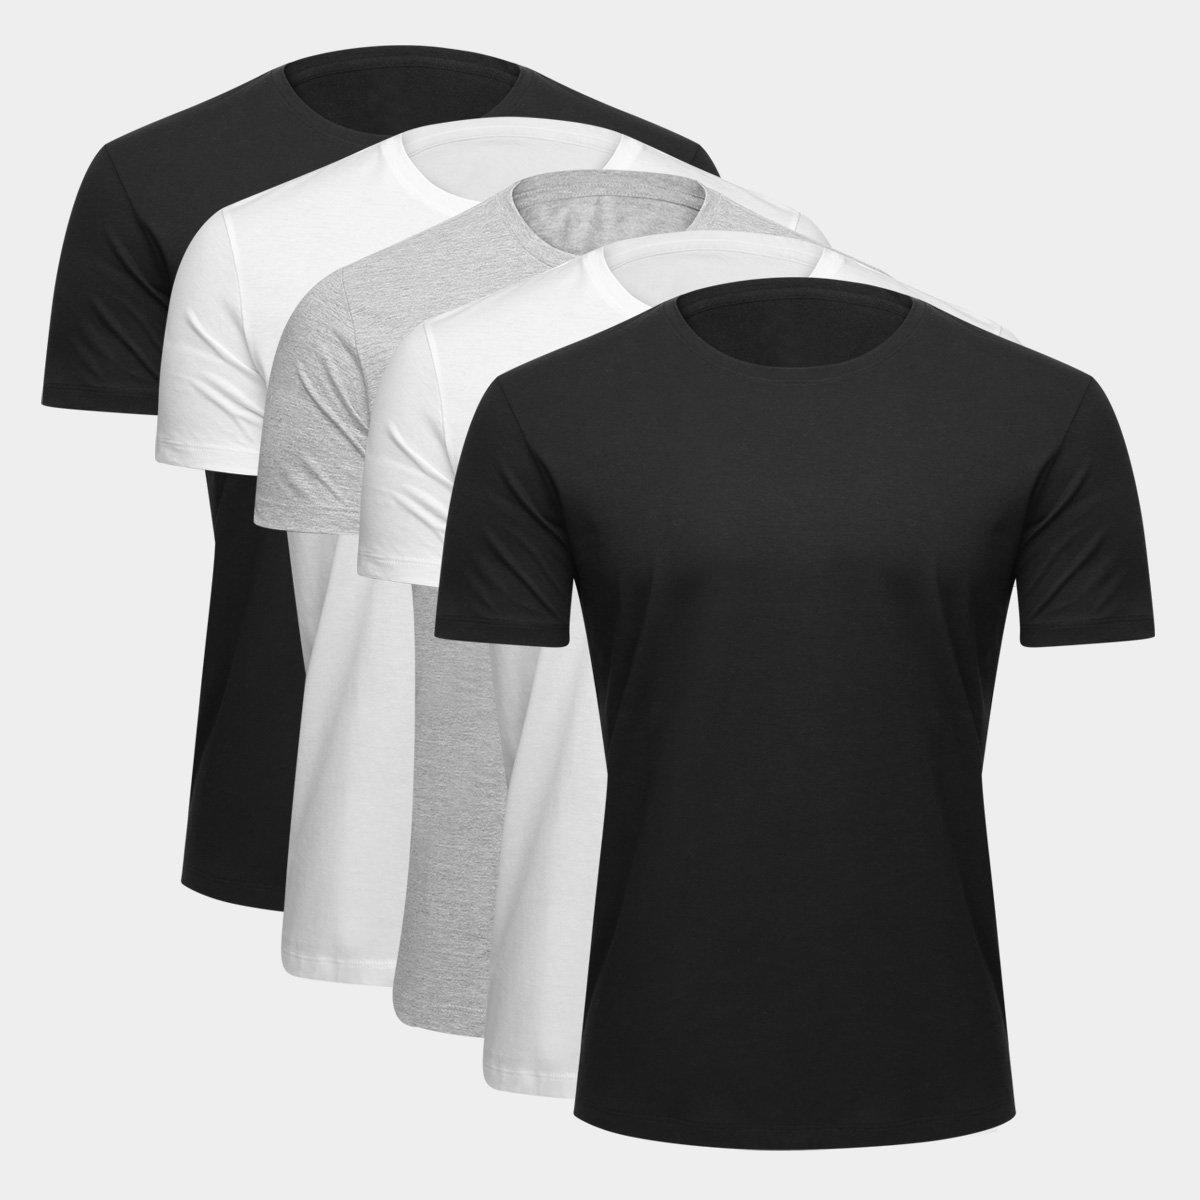 Kit Camiseta Básica c/ 5 Peças Masculinas - Tam: G